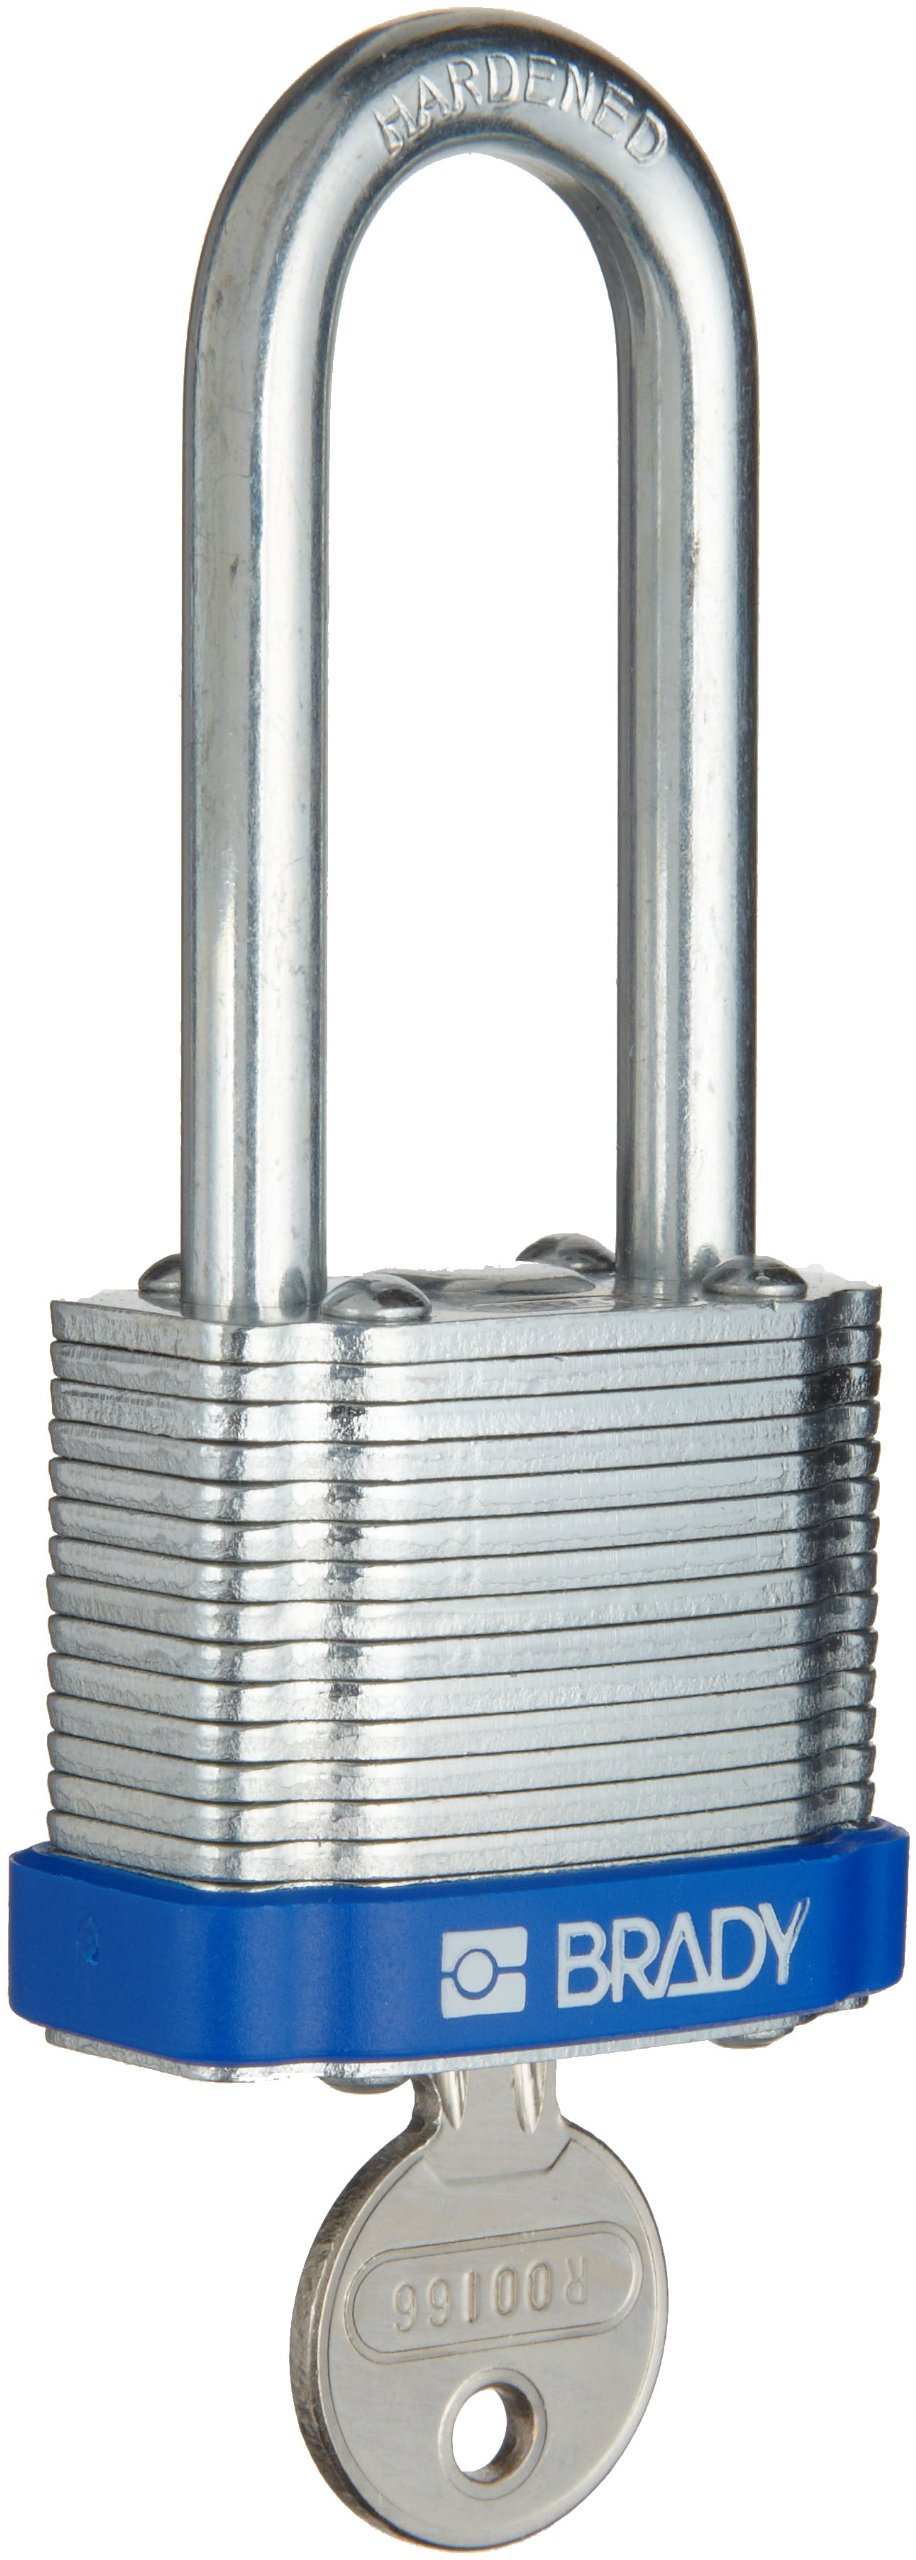 Brady Steel Lockout/Tagout Padlock, Keyed Alike,  1-1/3'' Body Length, 2'' Shackle Clearance, Blue (Pack of 3)